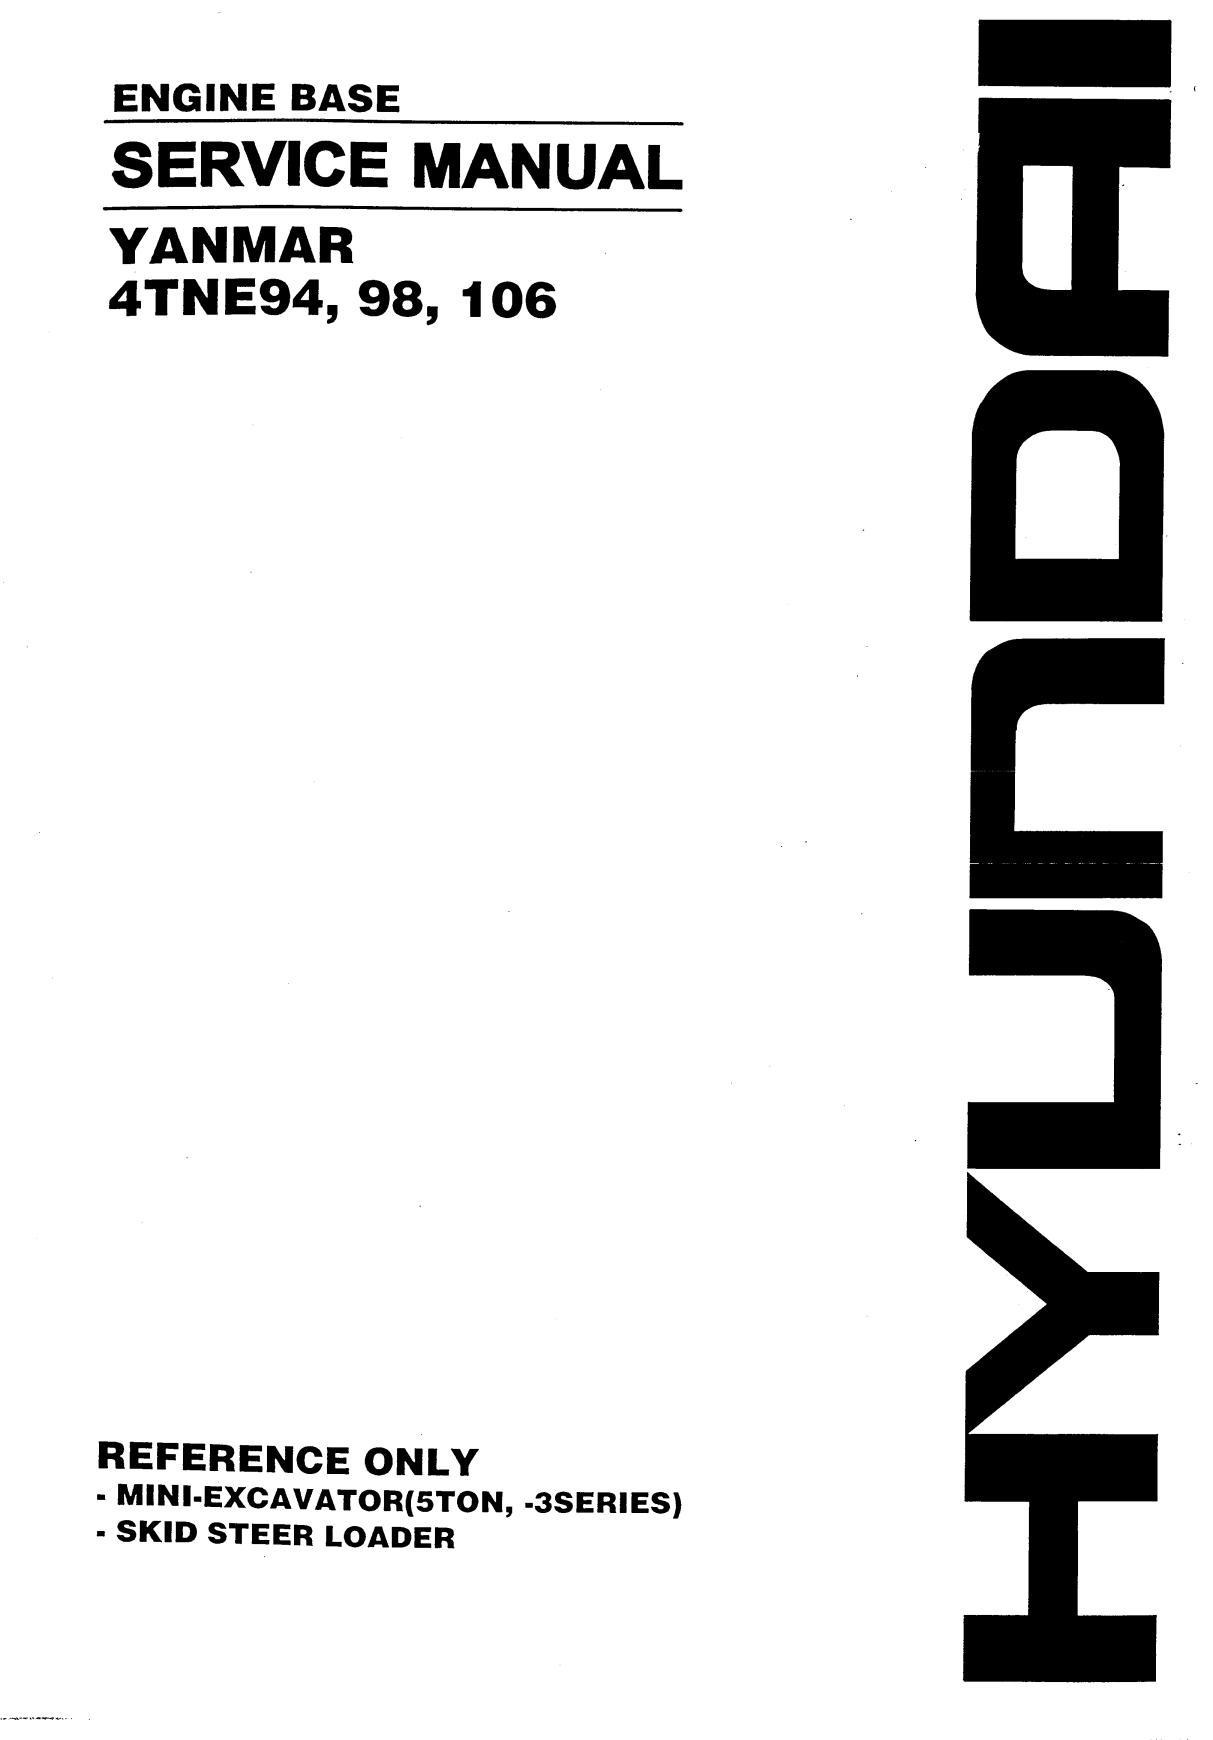 Ремонт и эксплуатация YANMAR 4TNE94, 98, 106